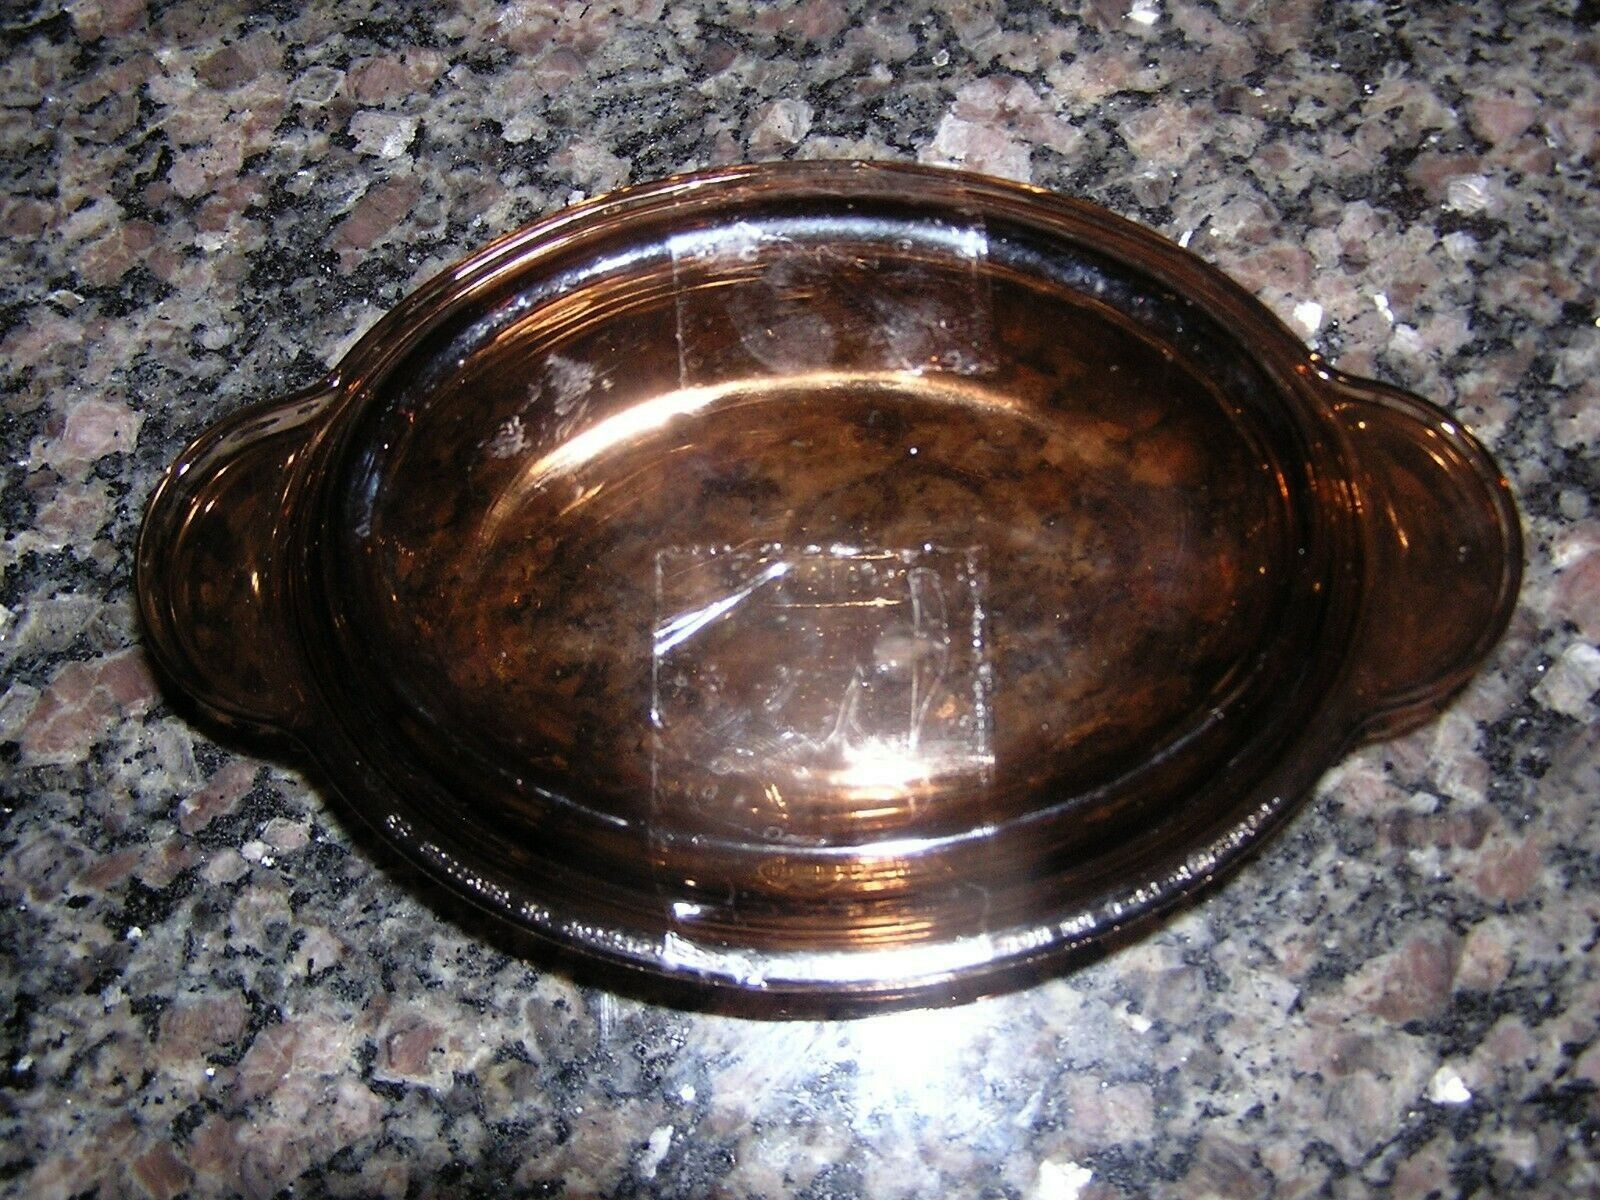 Corning Vision Ware Amber Grab it Bowls One Is Oval Casserole With Lids 15992 Corning Vision Ware Amber Grab it Bowls One Is Oval Casserole With Lids 1599 Waldorf Astoria...